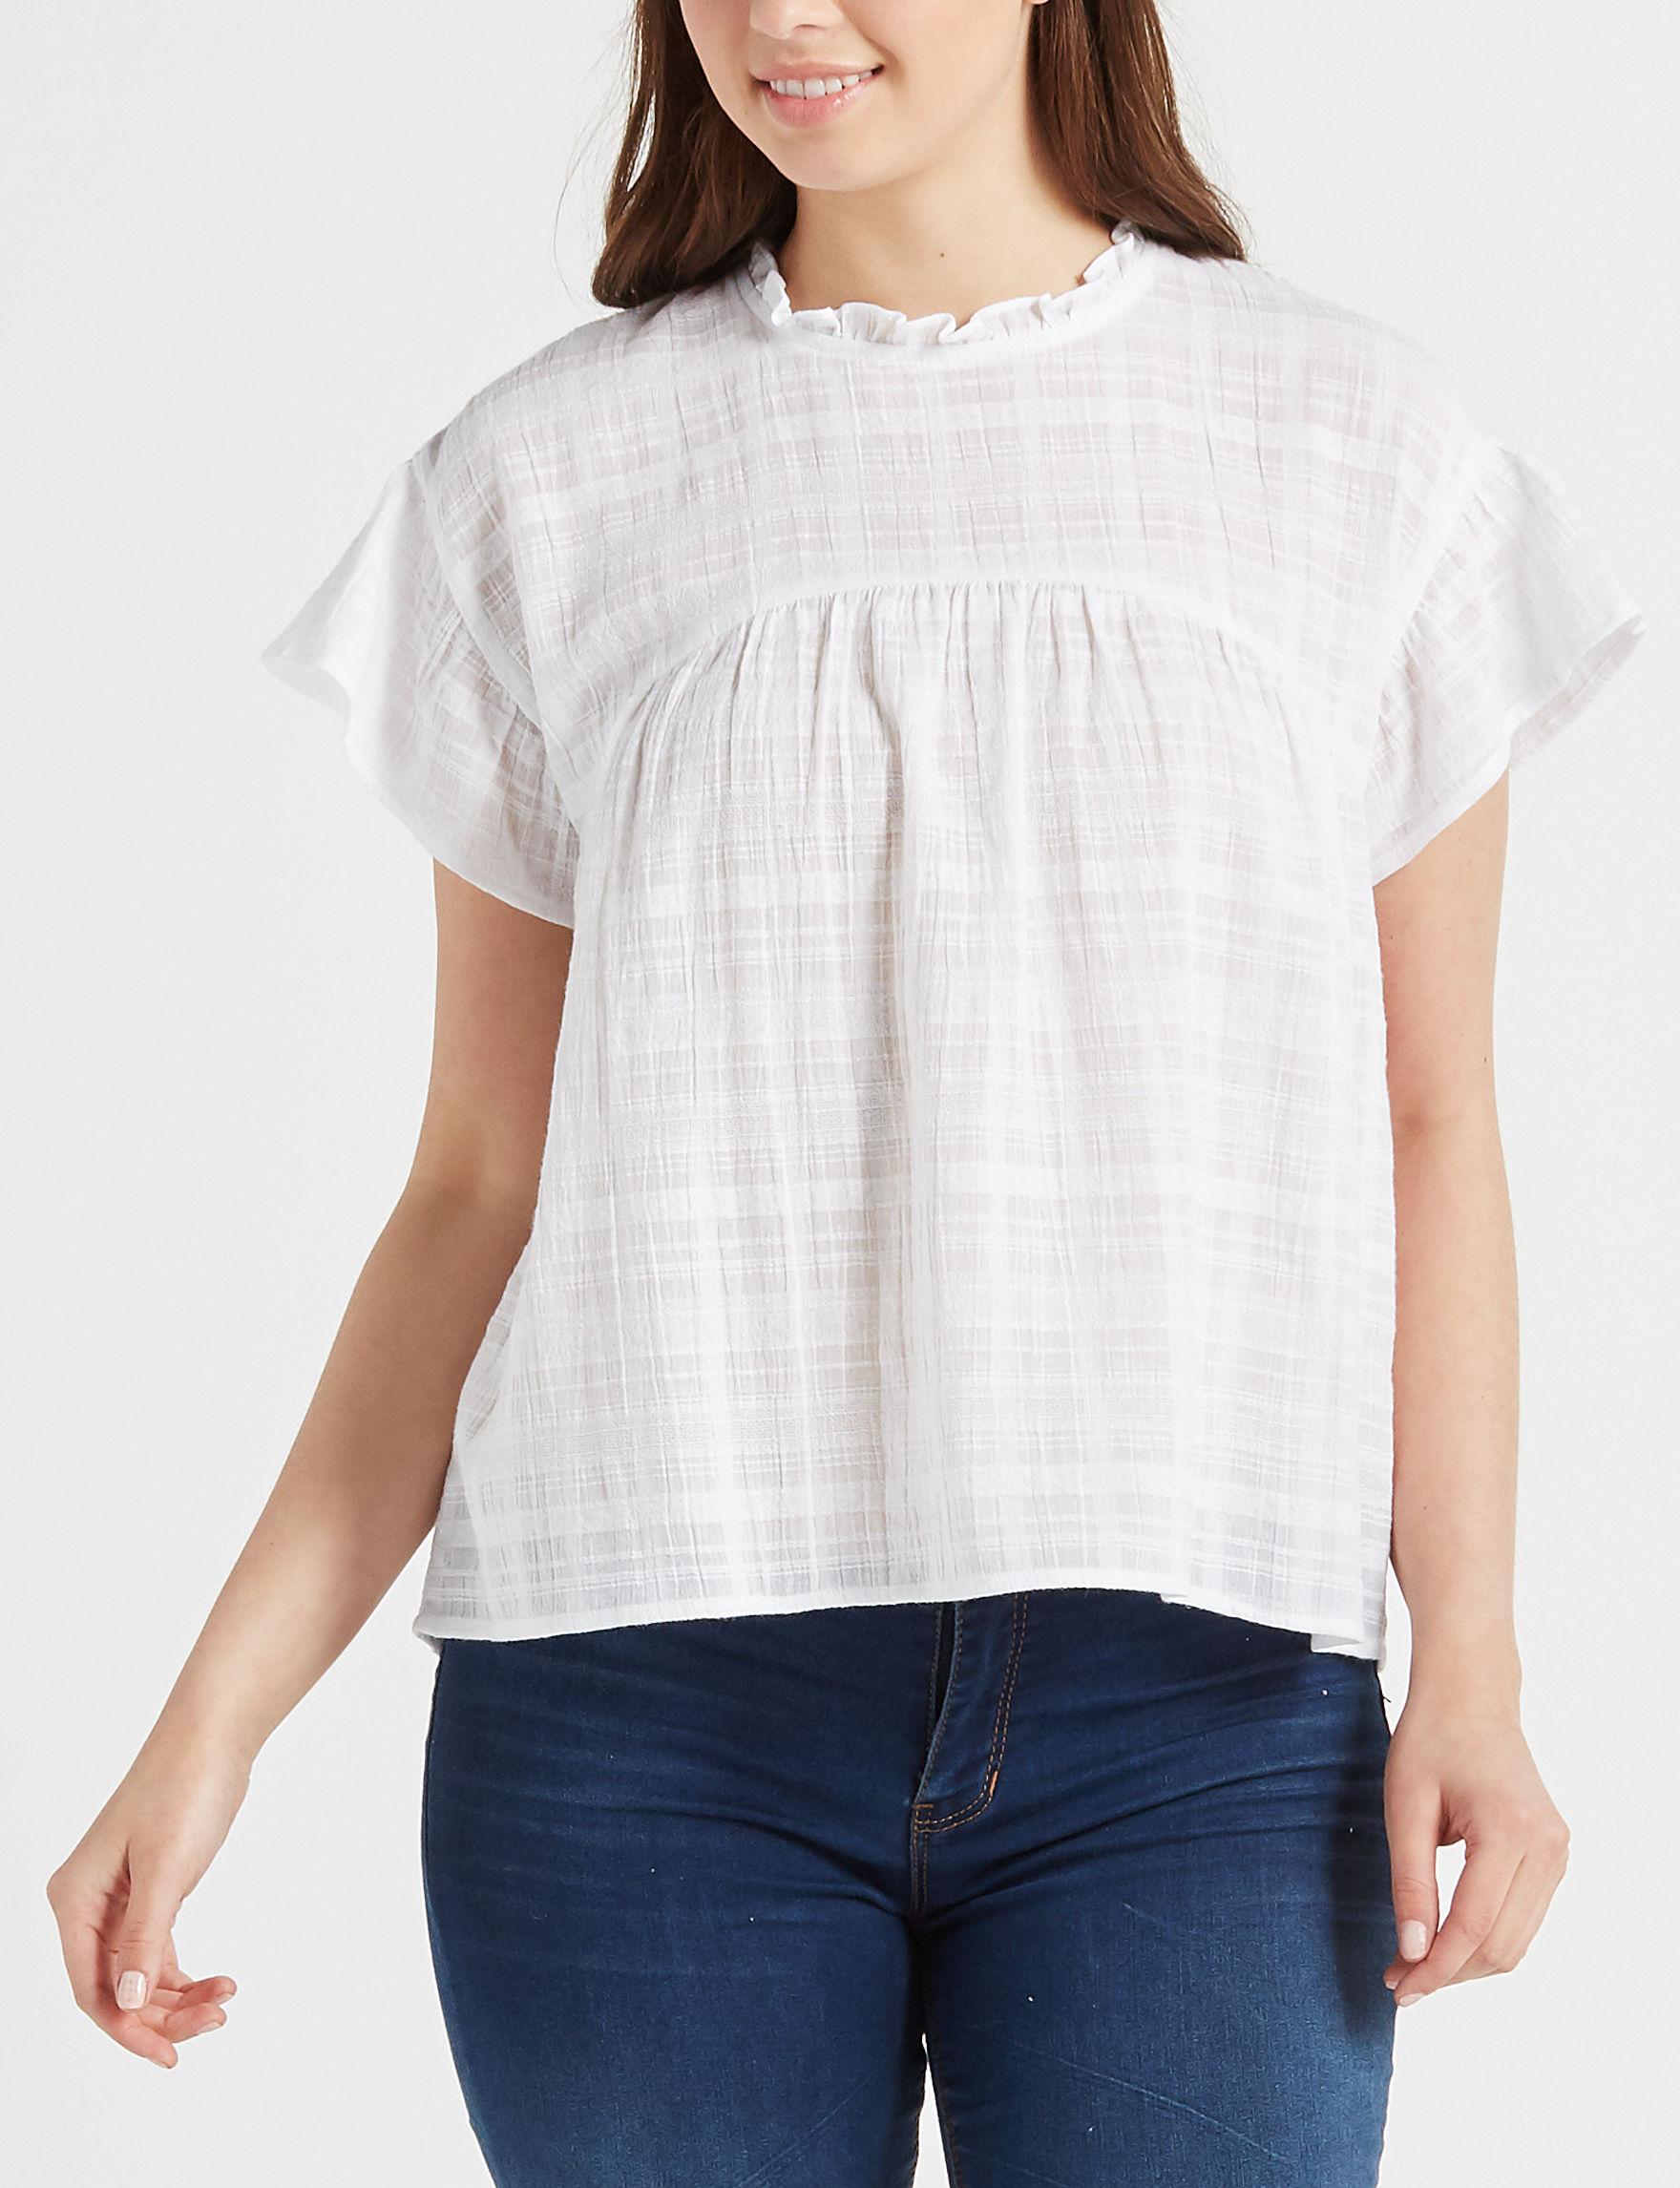 Eyeshadow White Shirts & Blouses